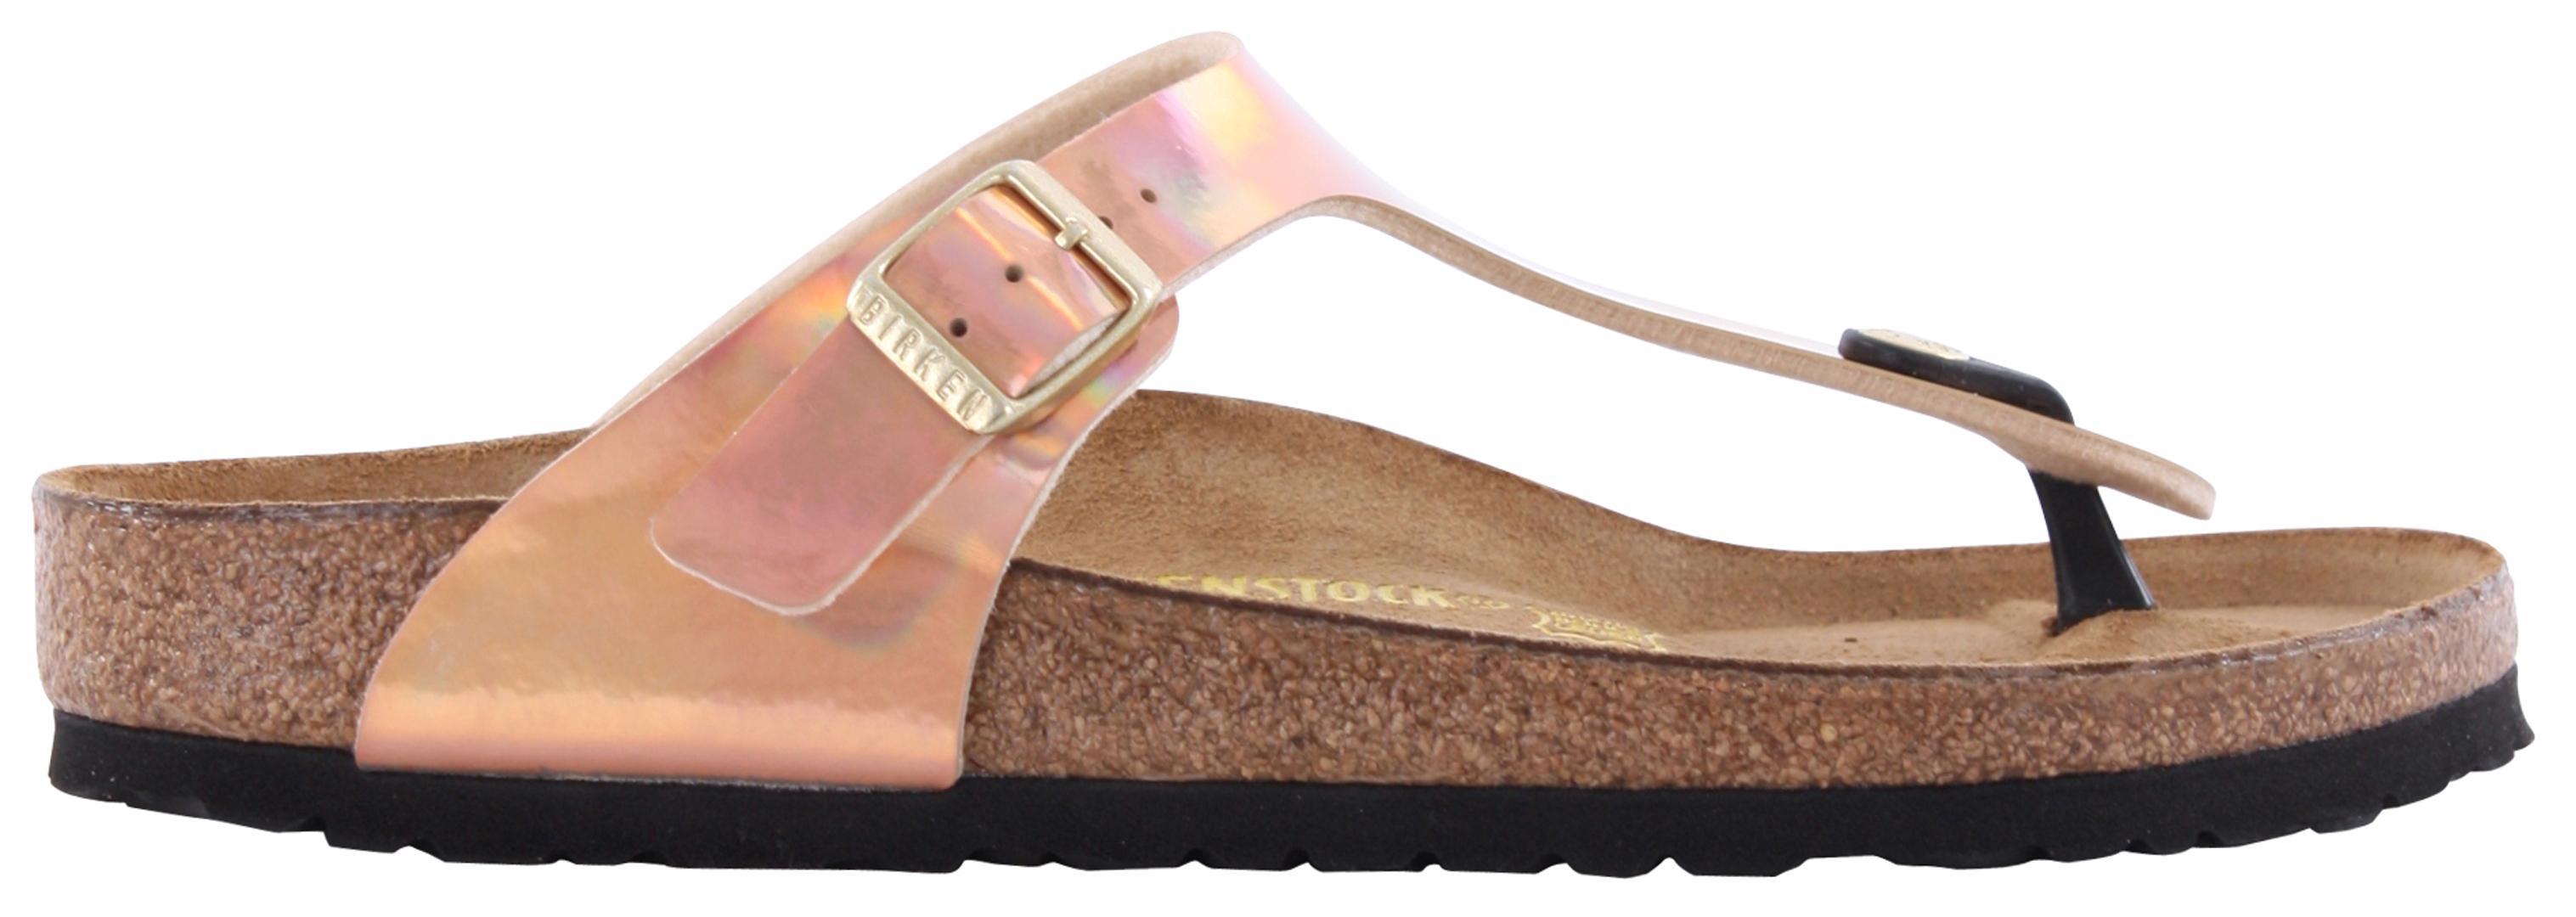 gizeh sandal 2015 mirror rose gold warehouse one. Black Bedroom Furniture Sets. Home Design Ideas